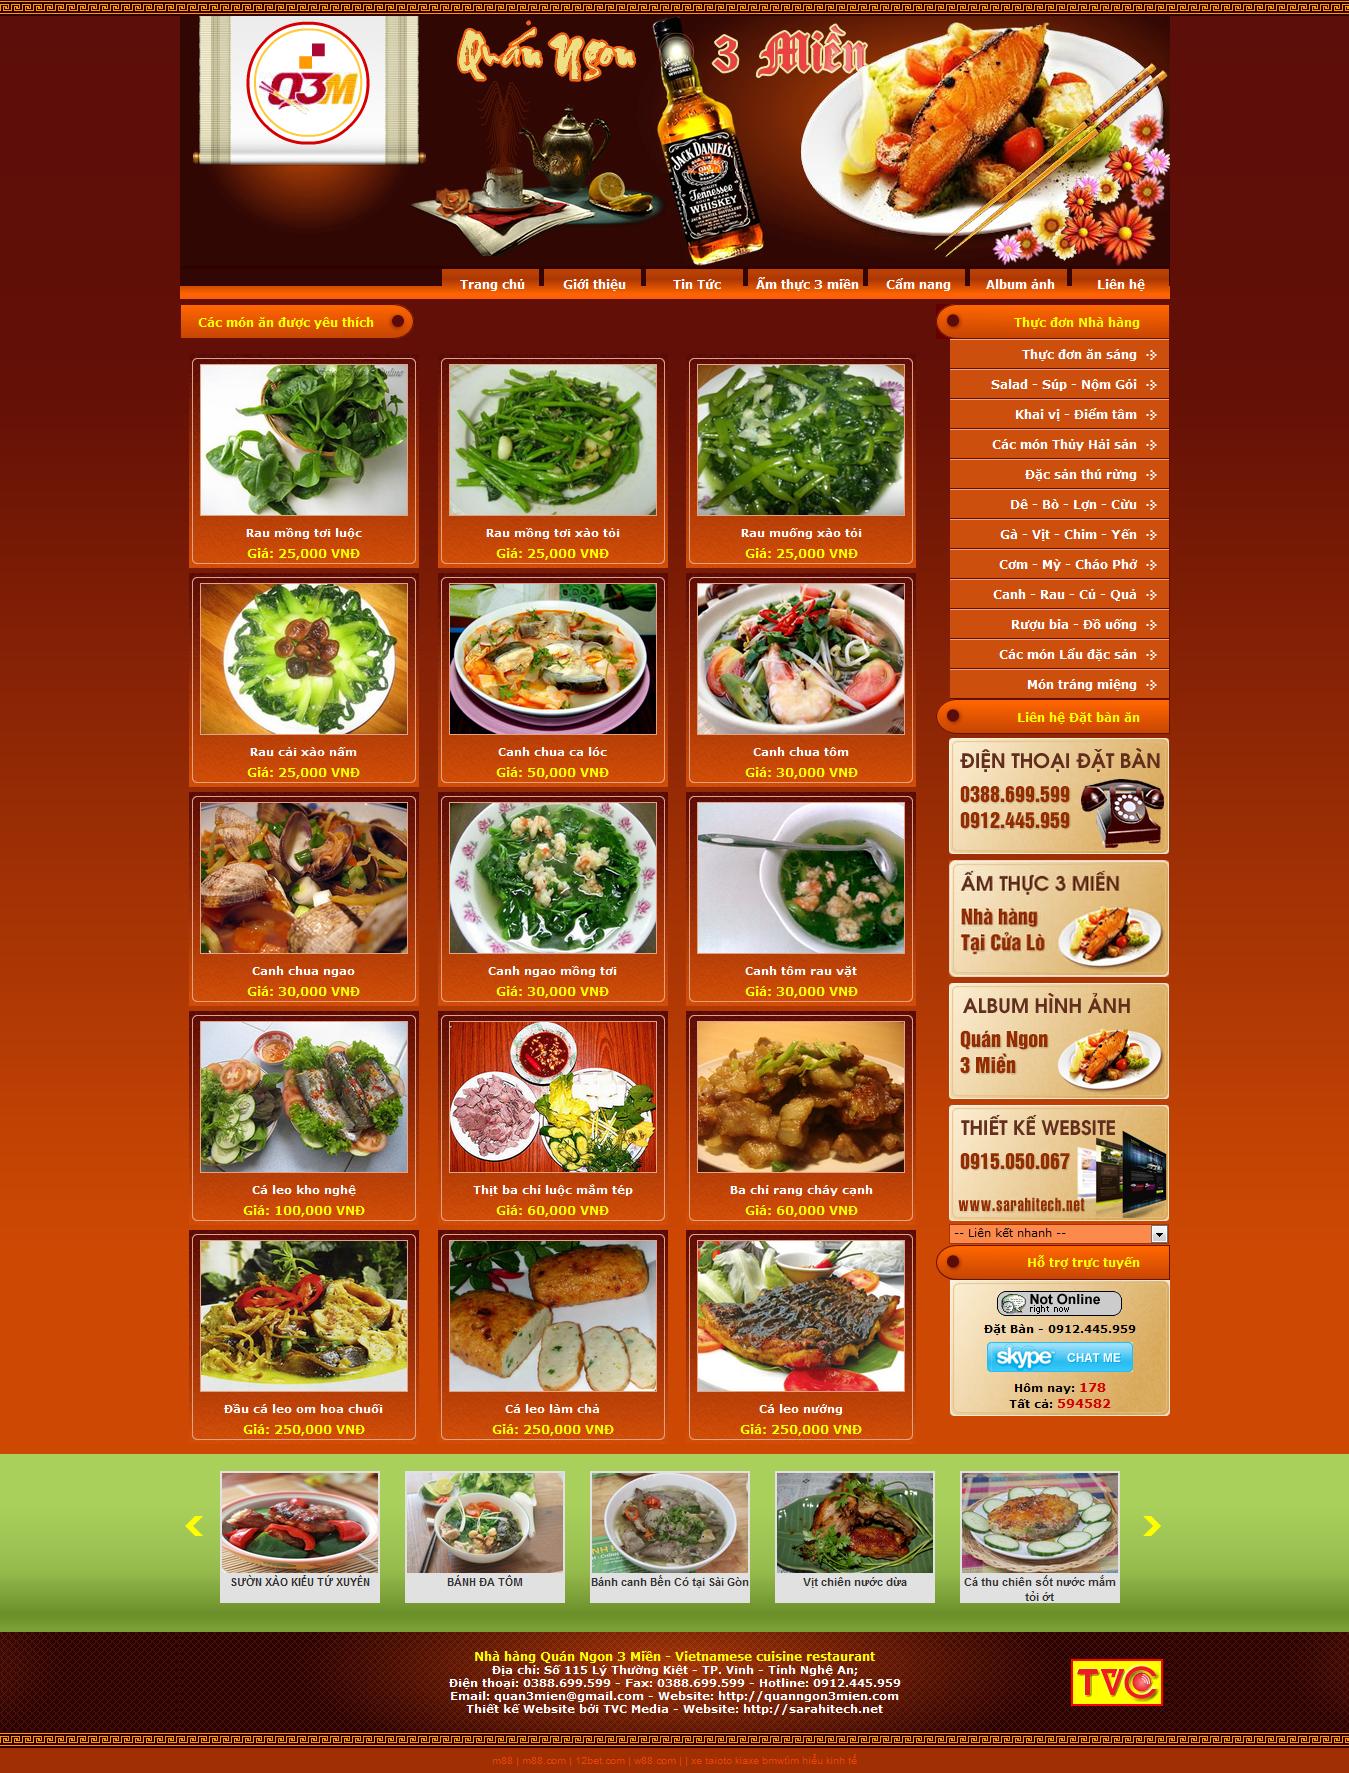 Mẫu website nhà hàng 10370